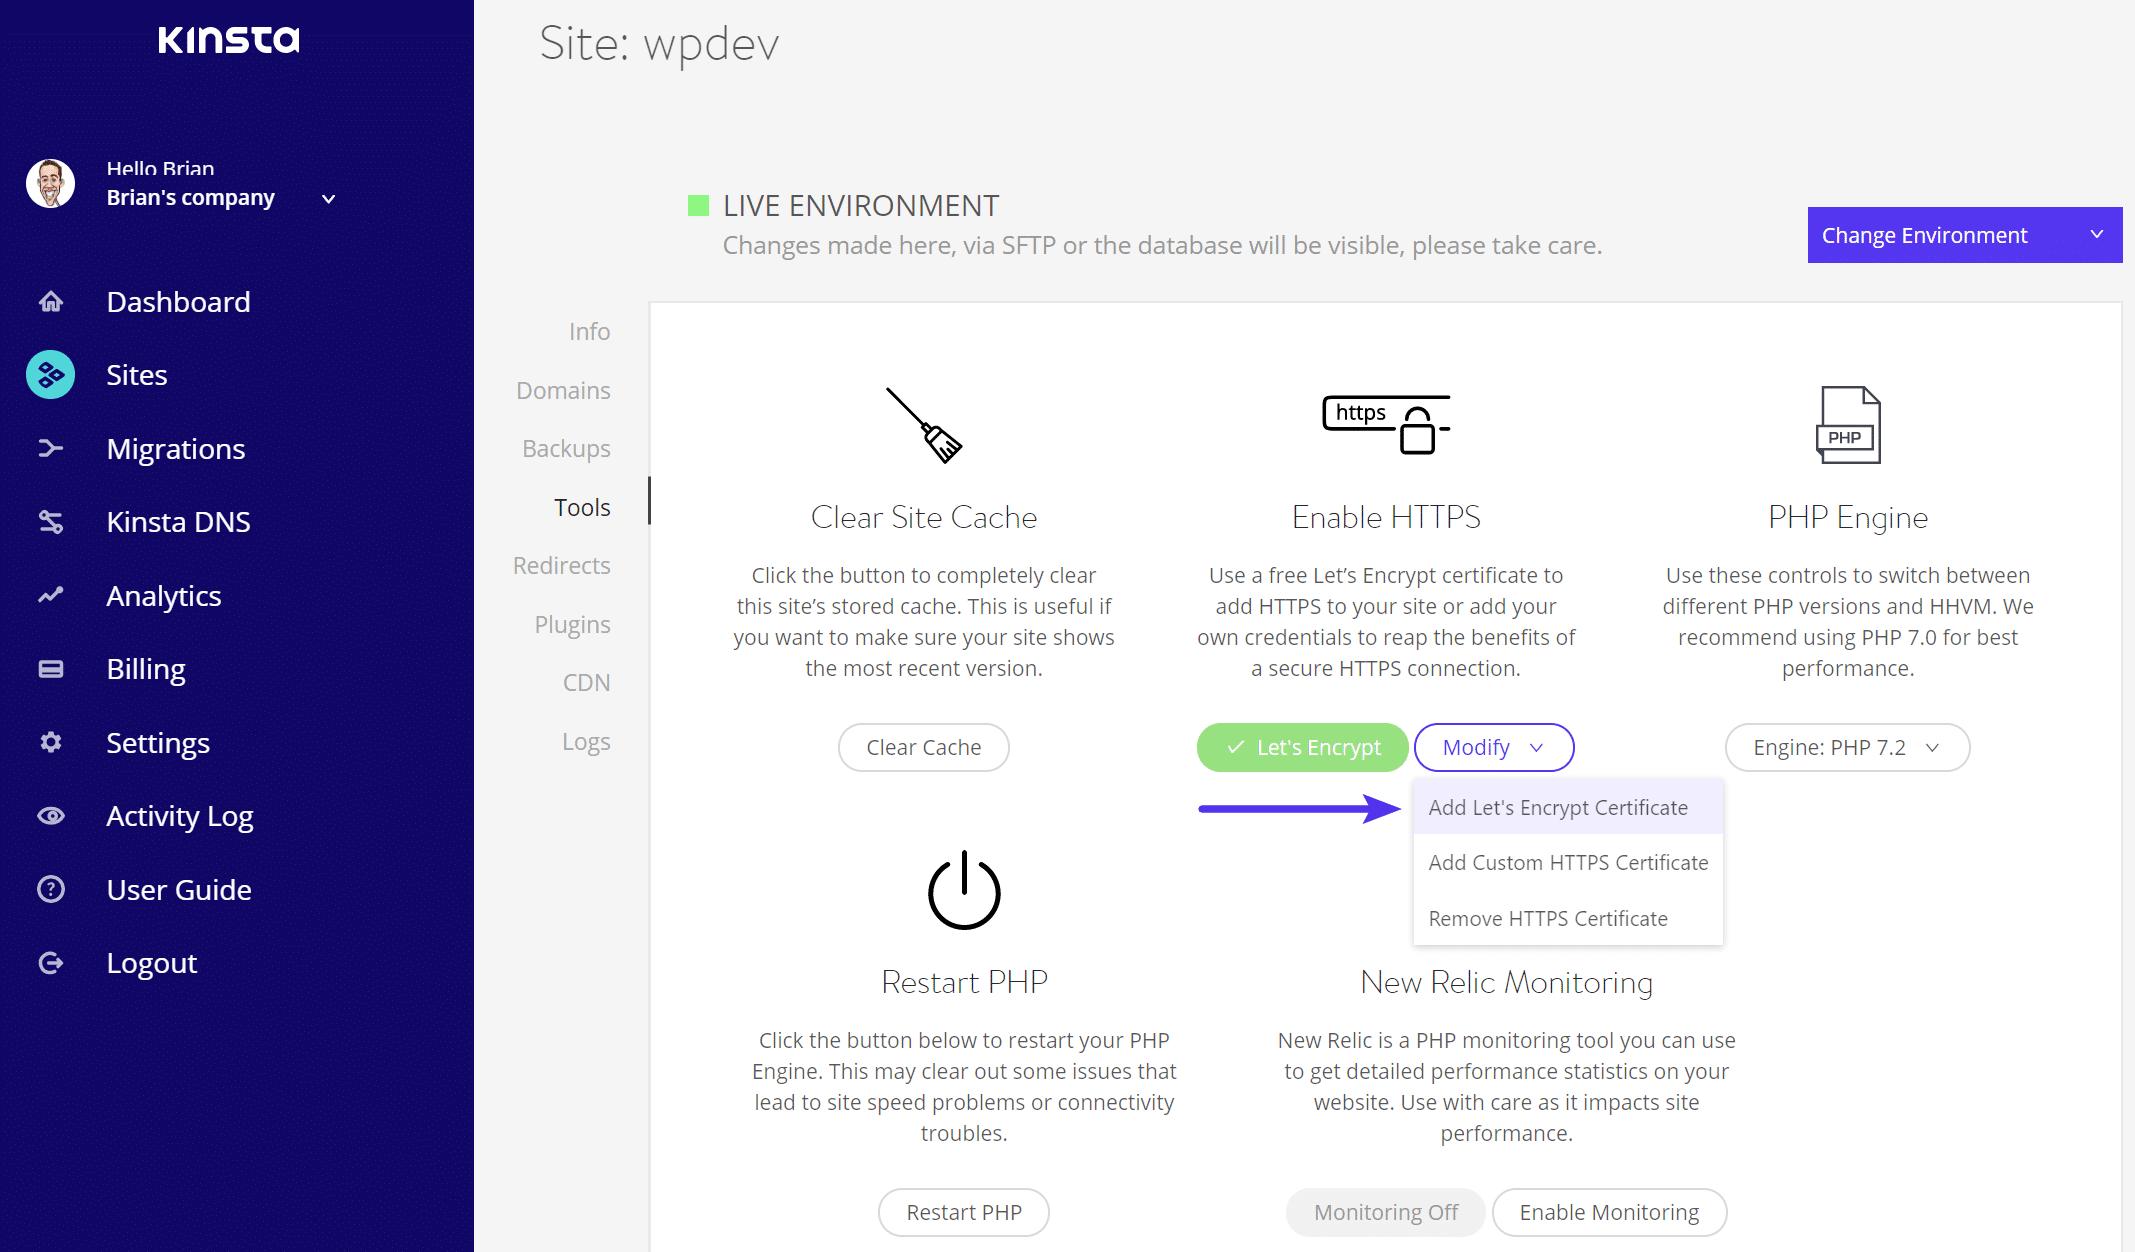 Adicionar o certificado Let's Encrypt